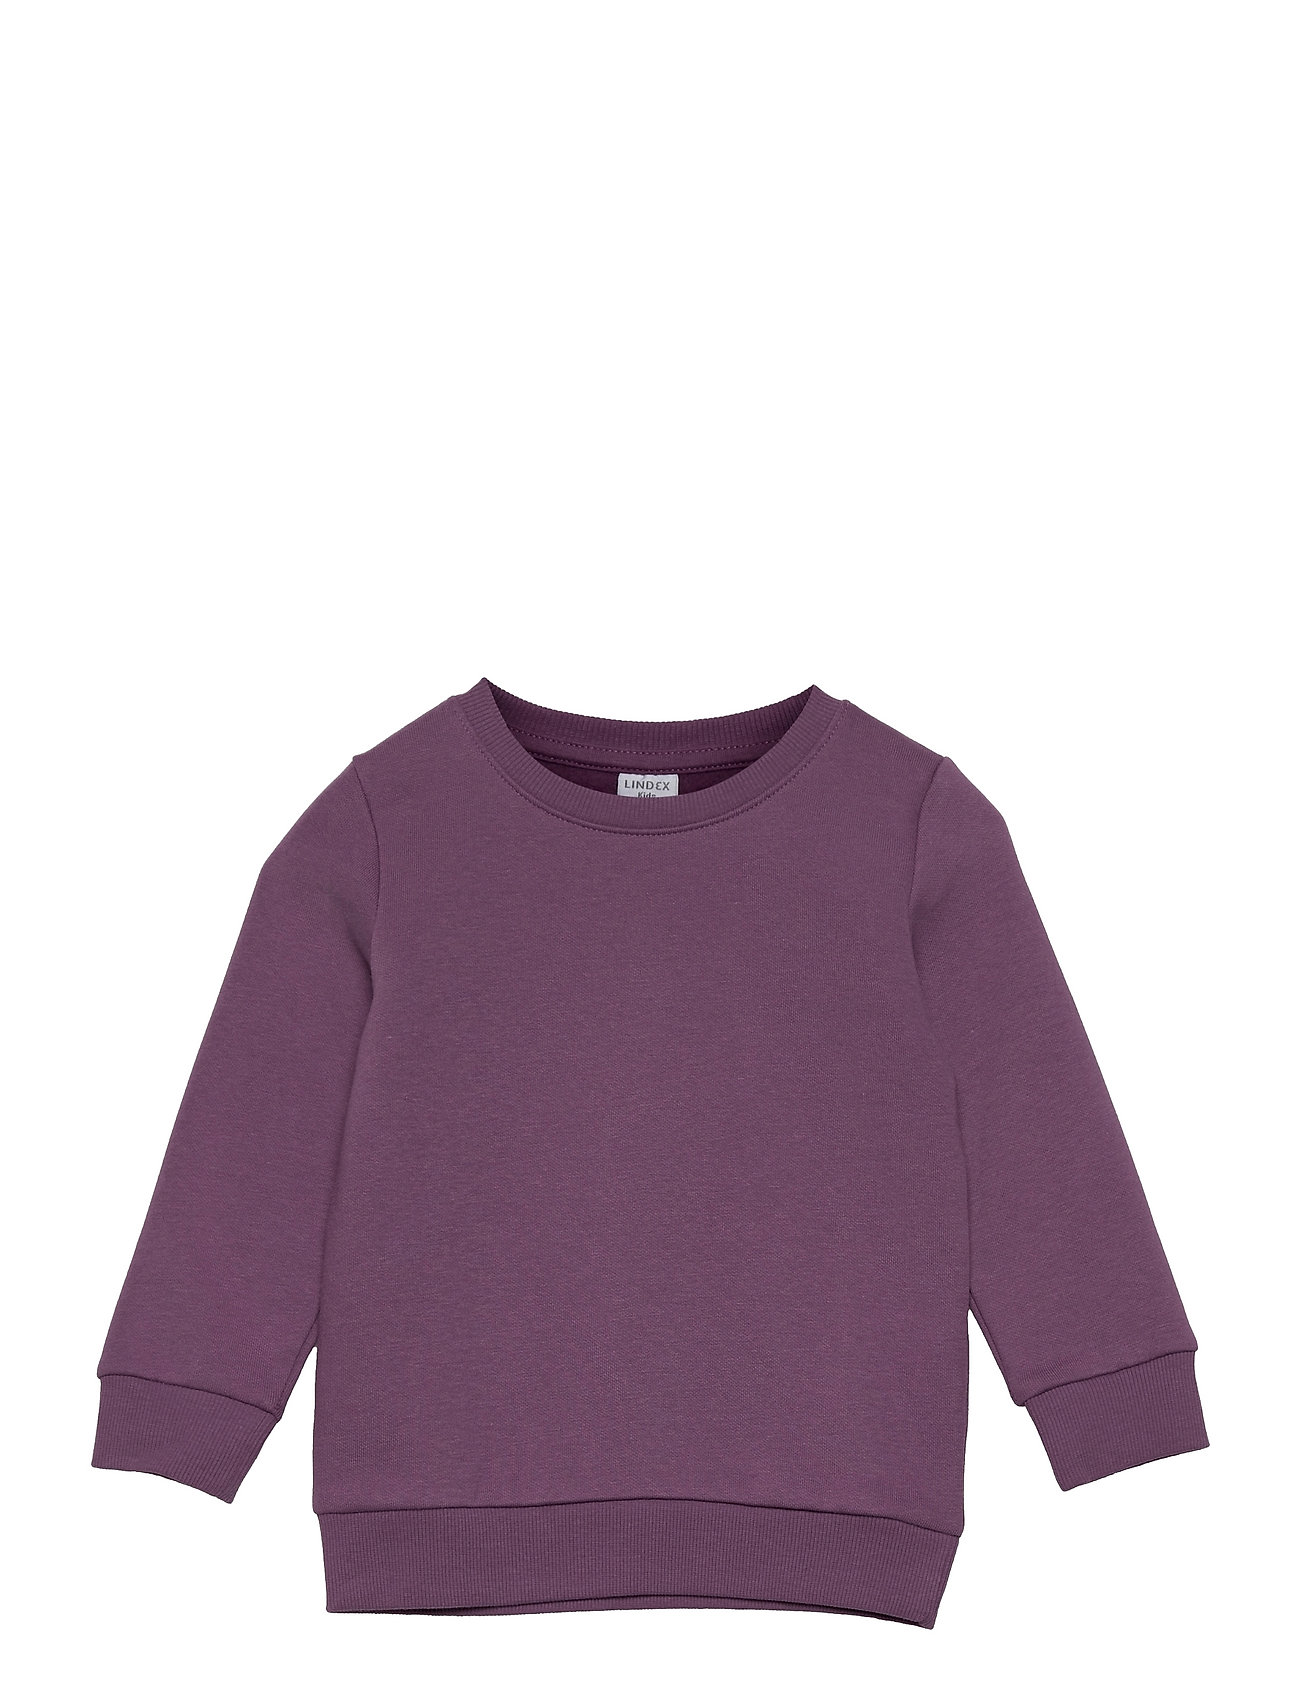 Sweater Basic Sweatshirt Trøje Lilla Lindex